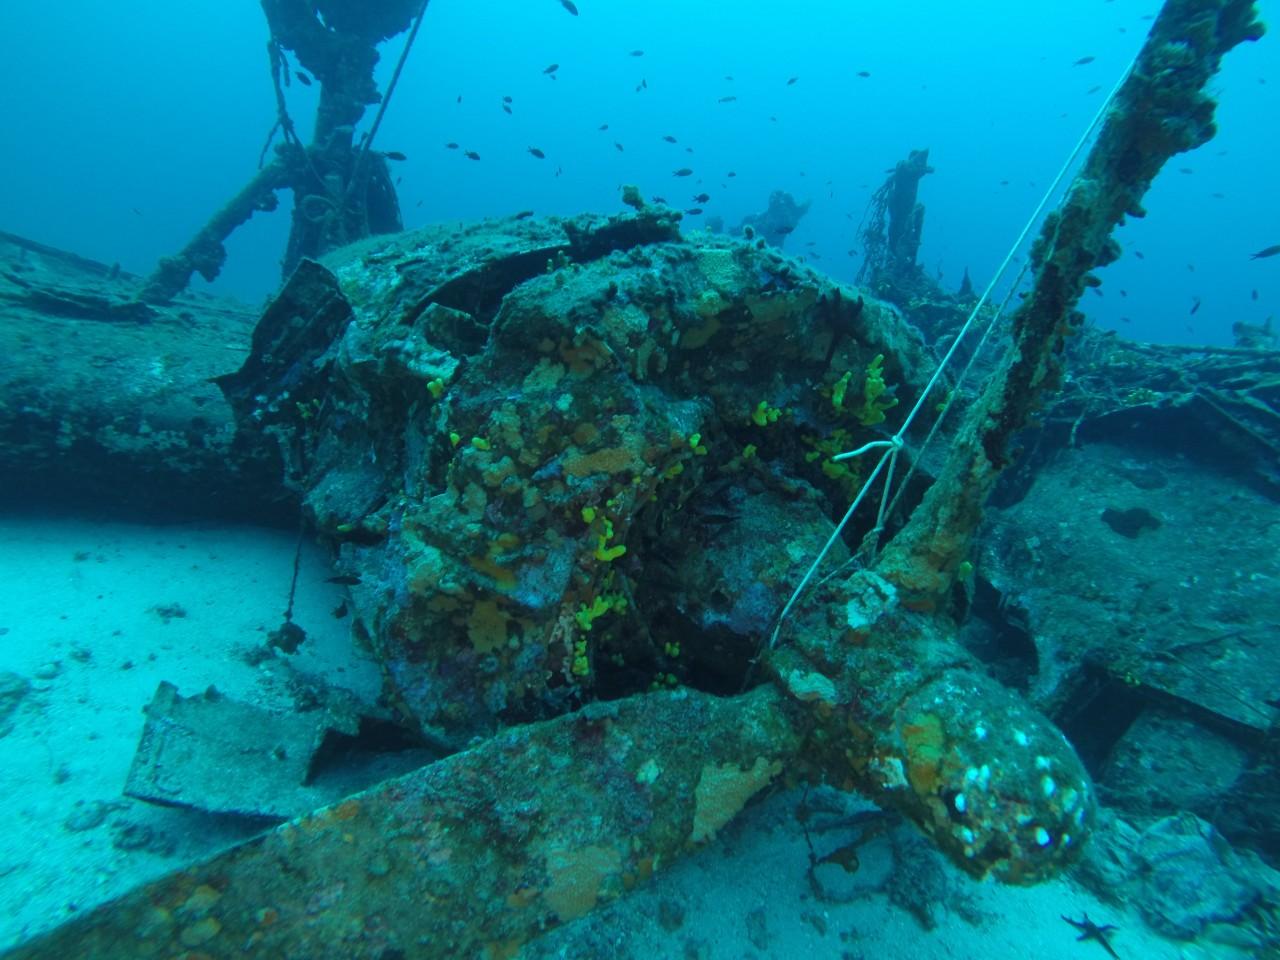 FEBRUARY 1, 2016 - VideoRay Pro 4 ROV Surveys Sunken WWII B-24 Bomber